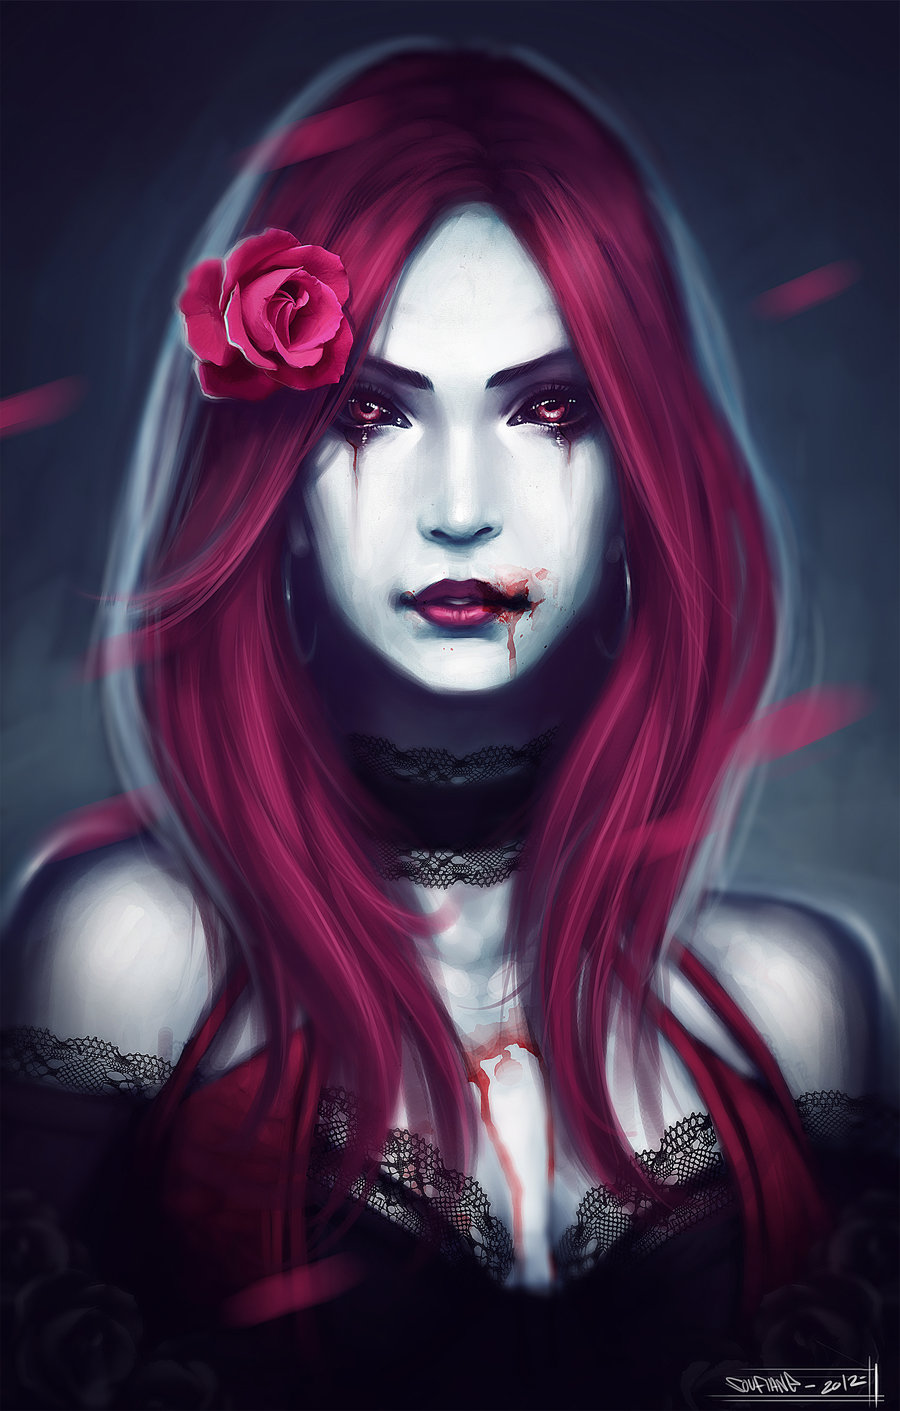 Drawn vampire art Art art gothic streetx222 by